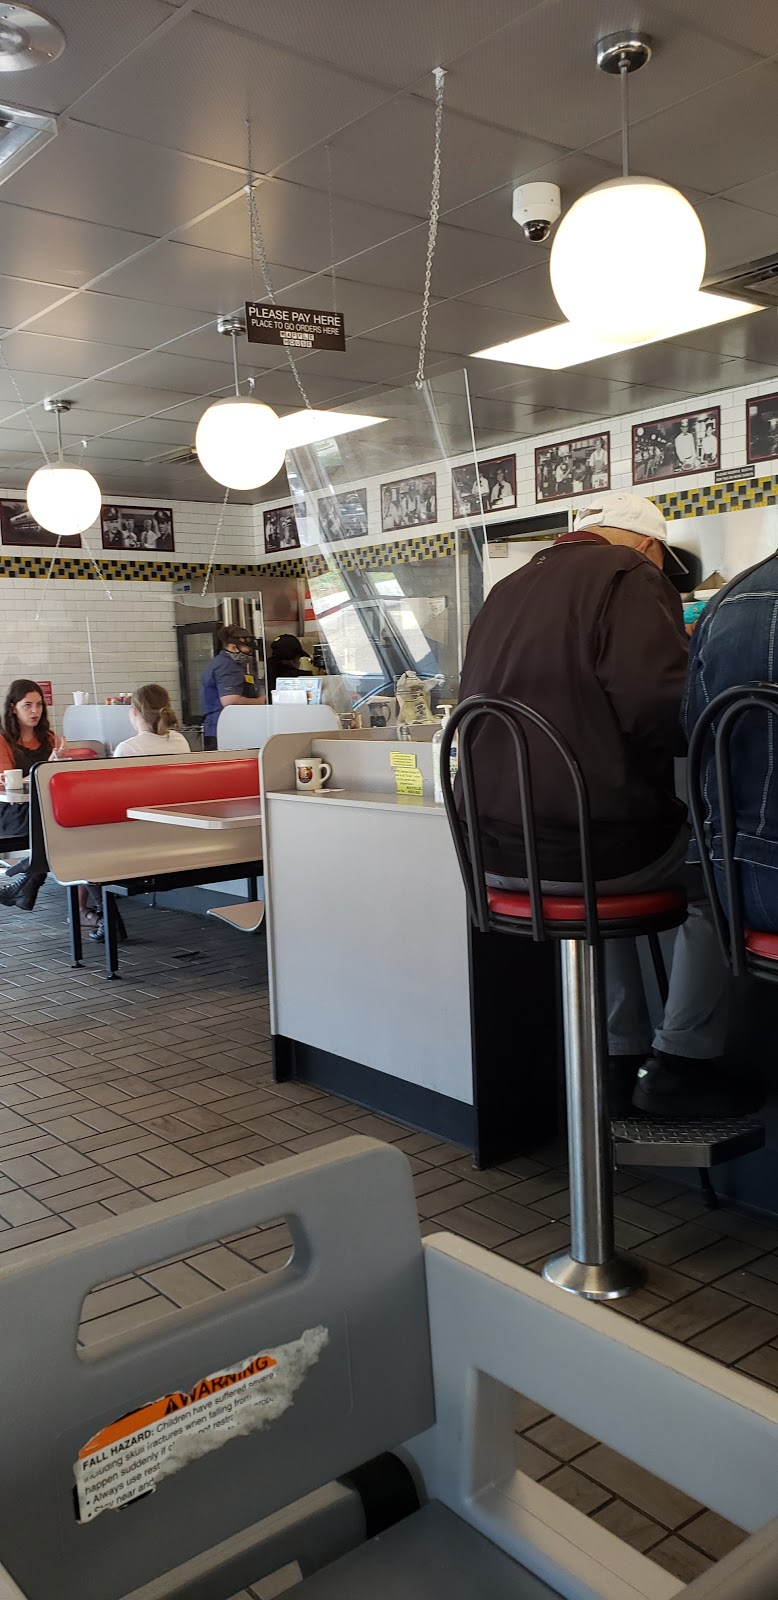 Waffle House - meal takeaway  | Photo 4 of 10 | Address: 1405 University Dr, Burlington, NC 27215, USA | Phone: (336) 684-8502